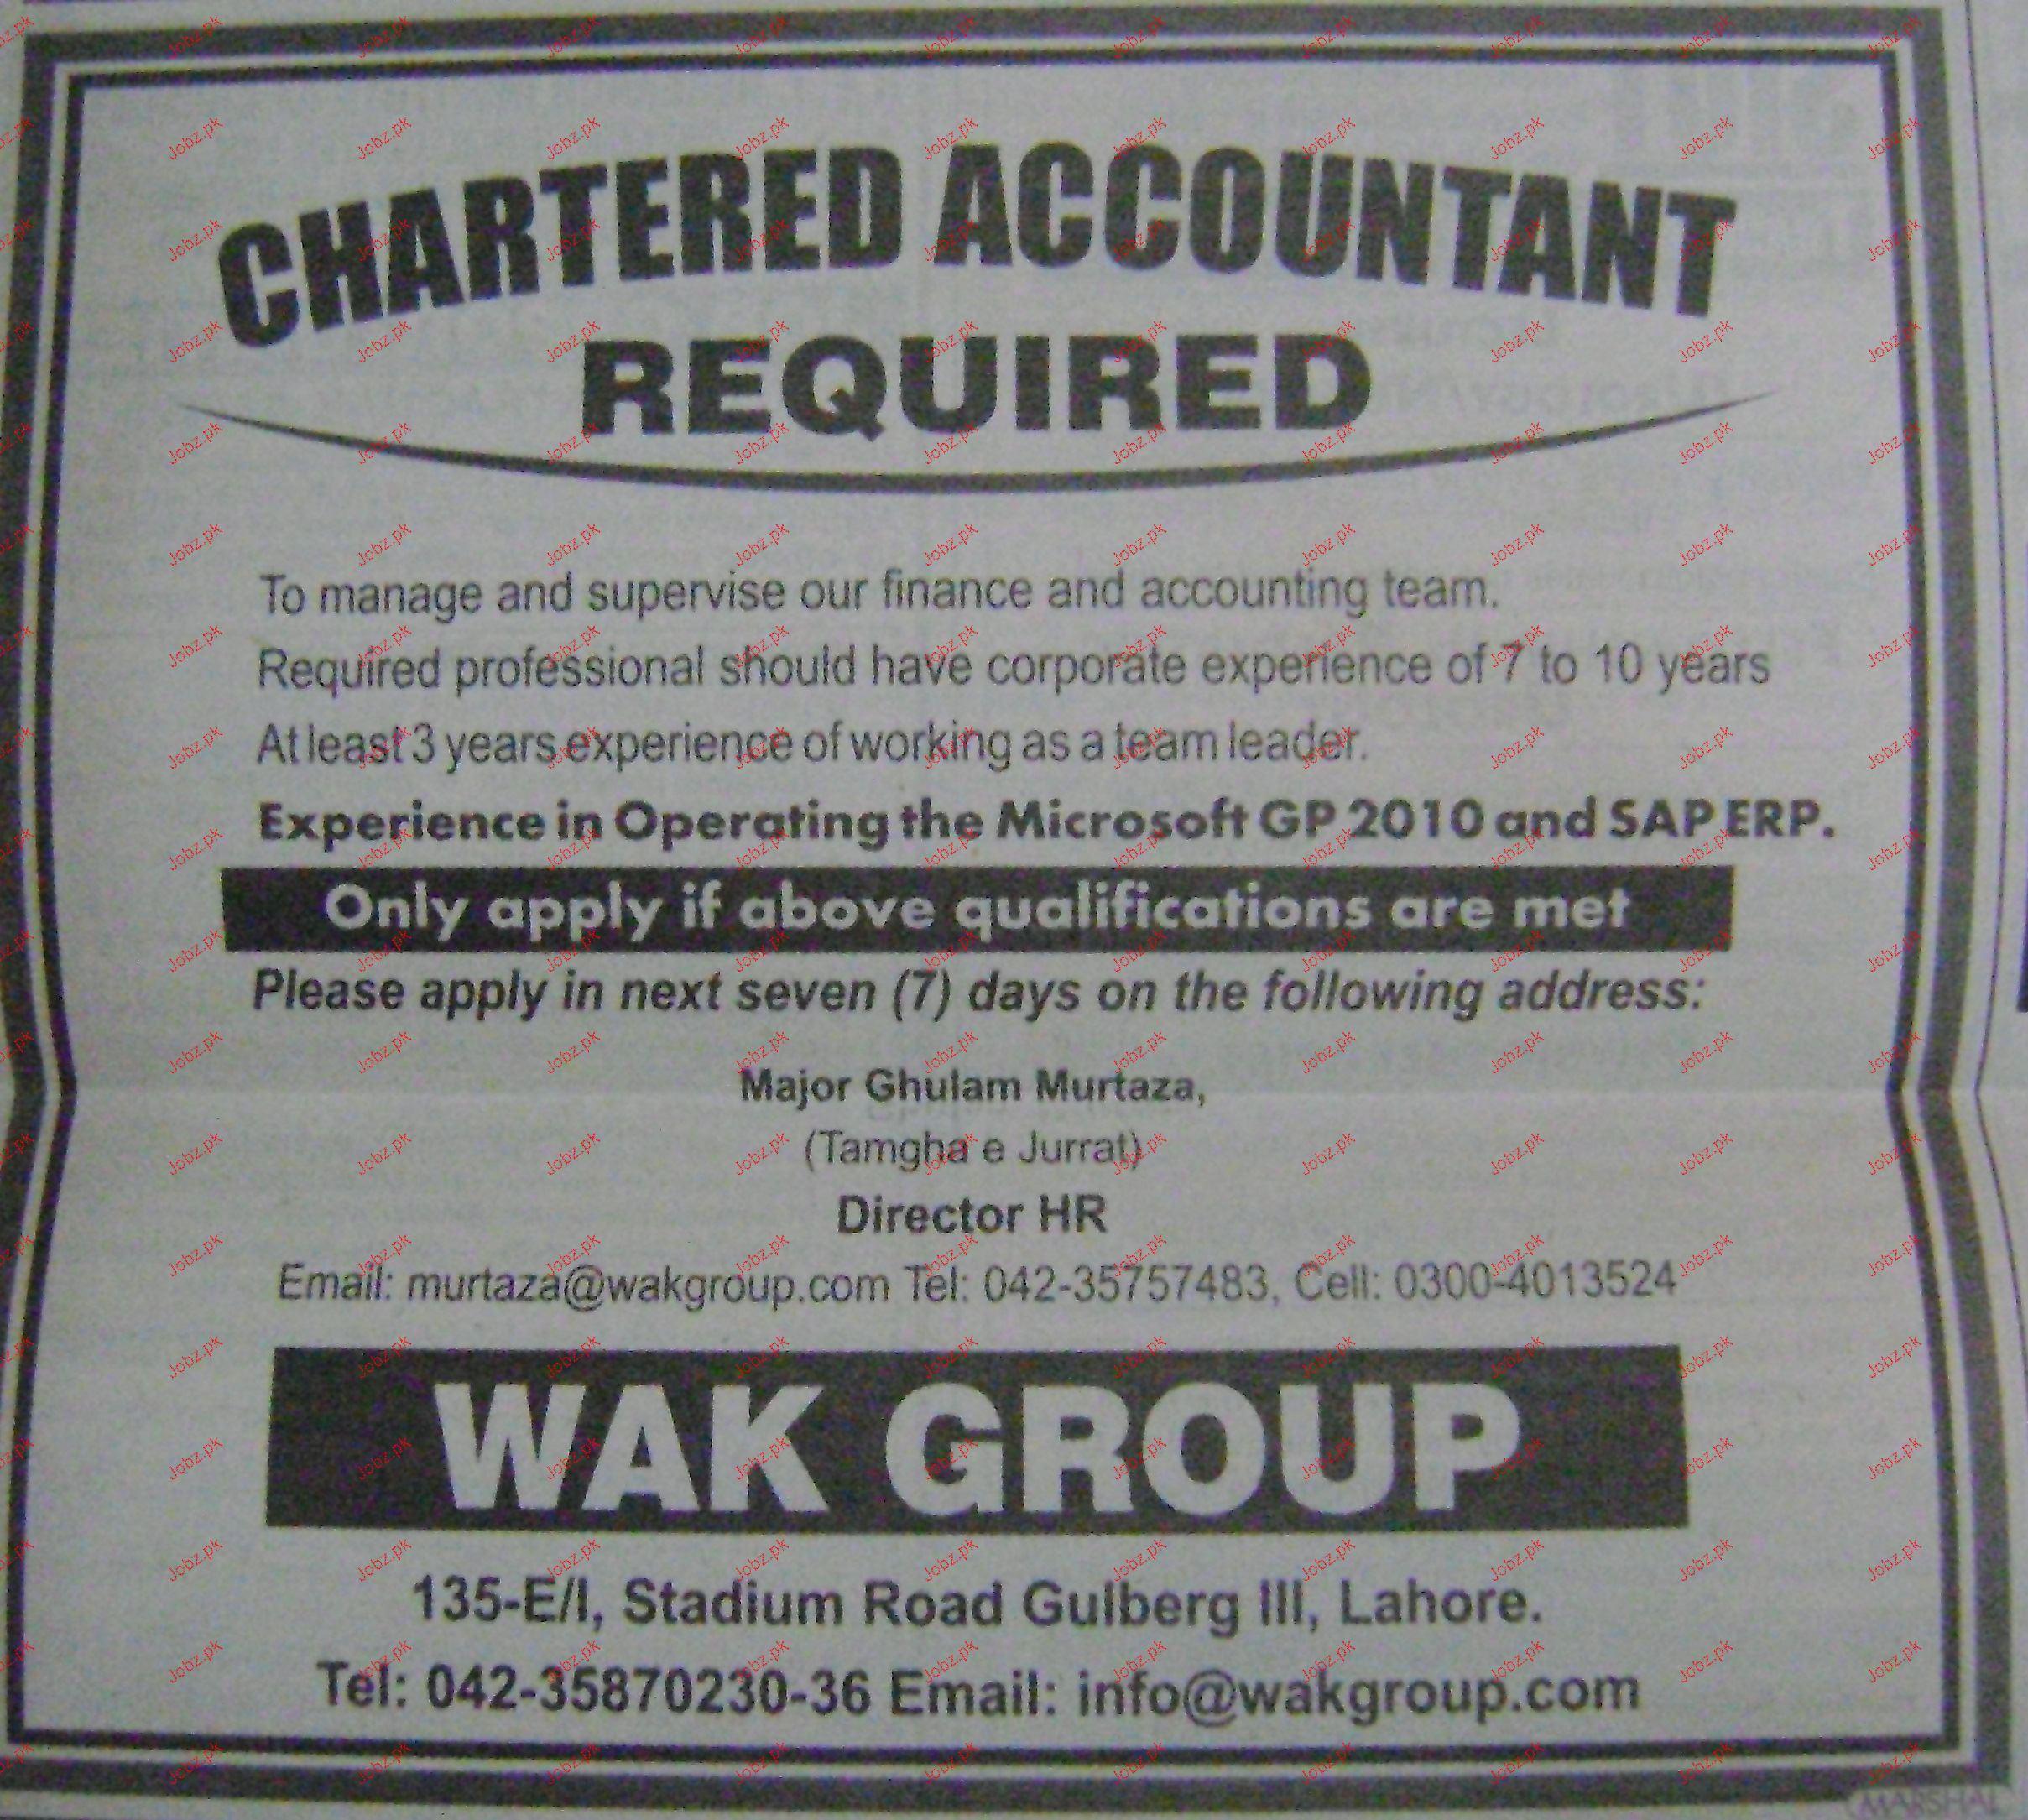 Chartered Accountant Job Opportunity 2019 Job